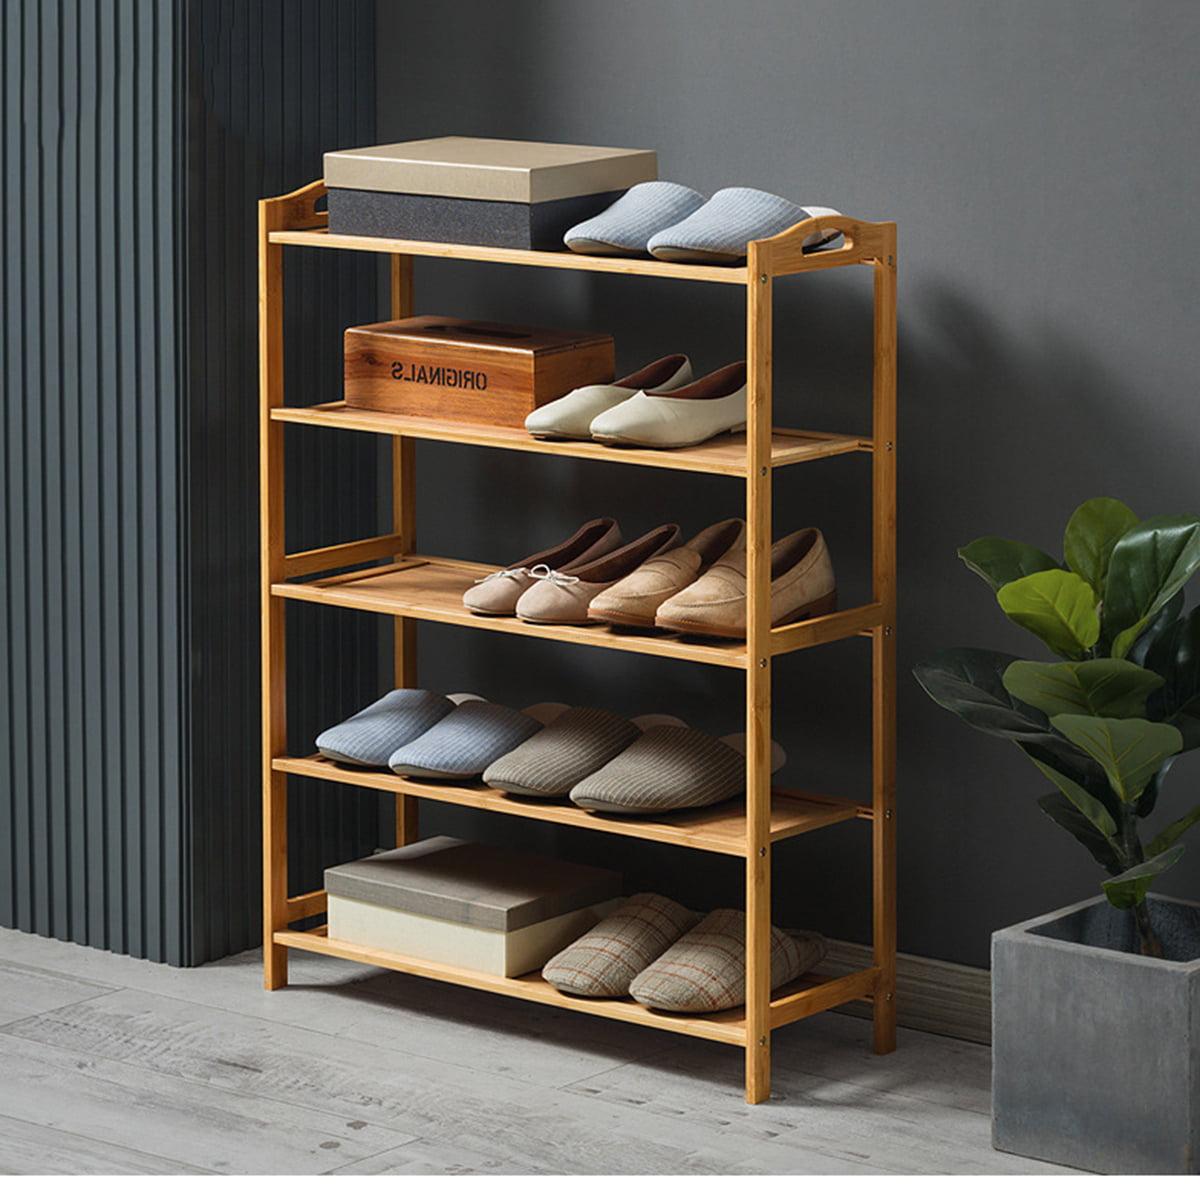 High Quality 6 Tier Wood Bamboo Shelf Entryway Storage Shoe Rack Home Furniture